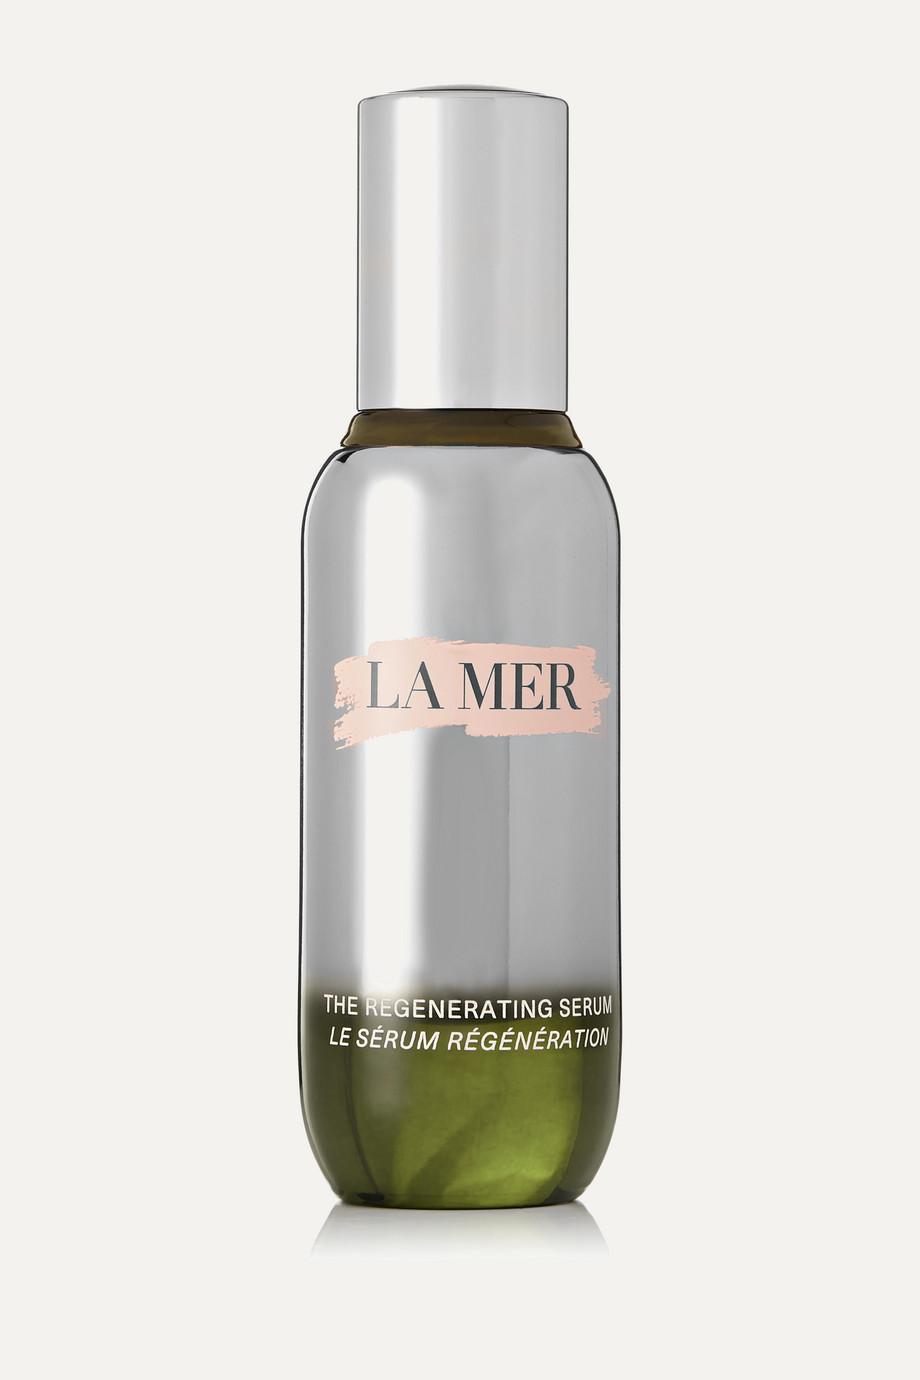 La Mer The Regenerating Serum, 30ml